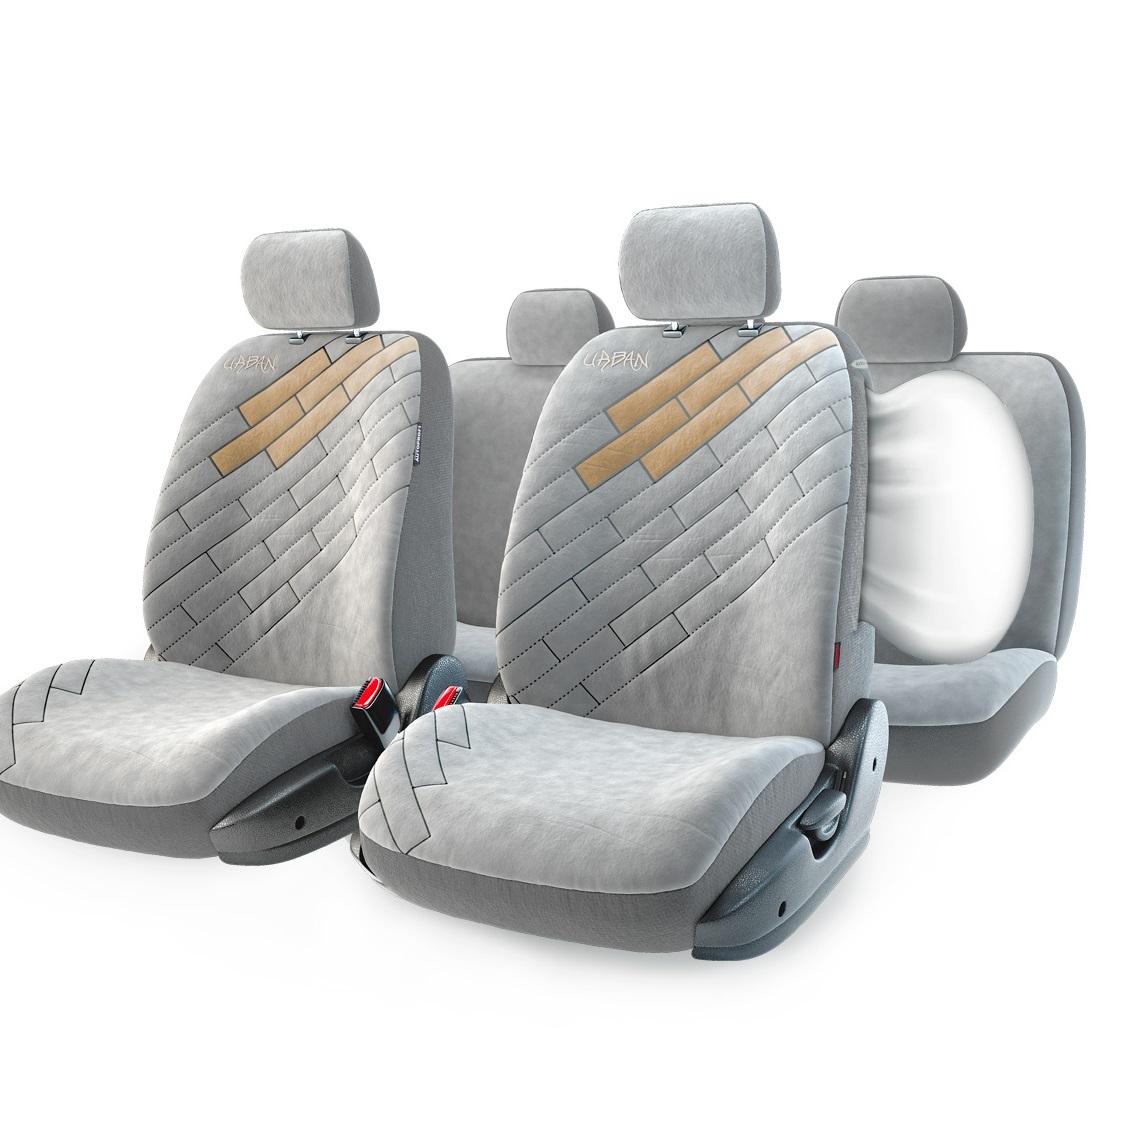 Чехол на сиденье Autoprofi Urb-1105 gy (m) чехол на сиденье autoprofi mtx 1105 bk d gy m